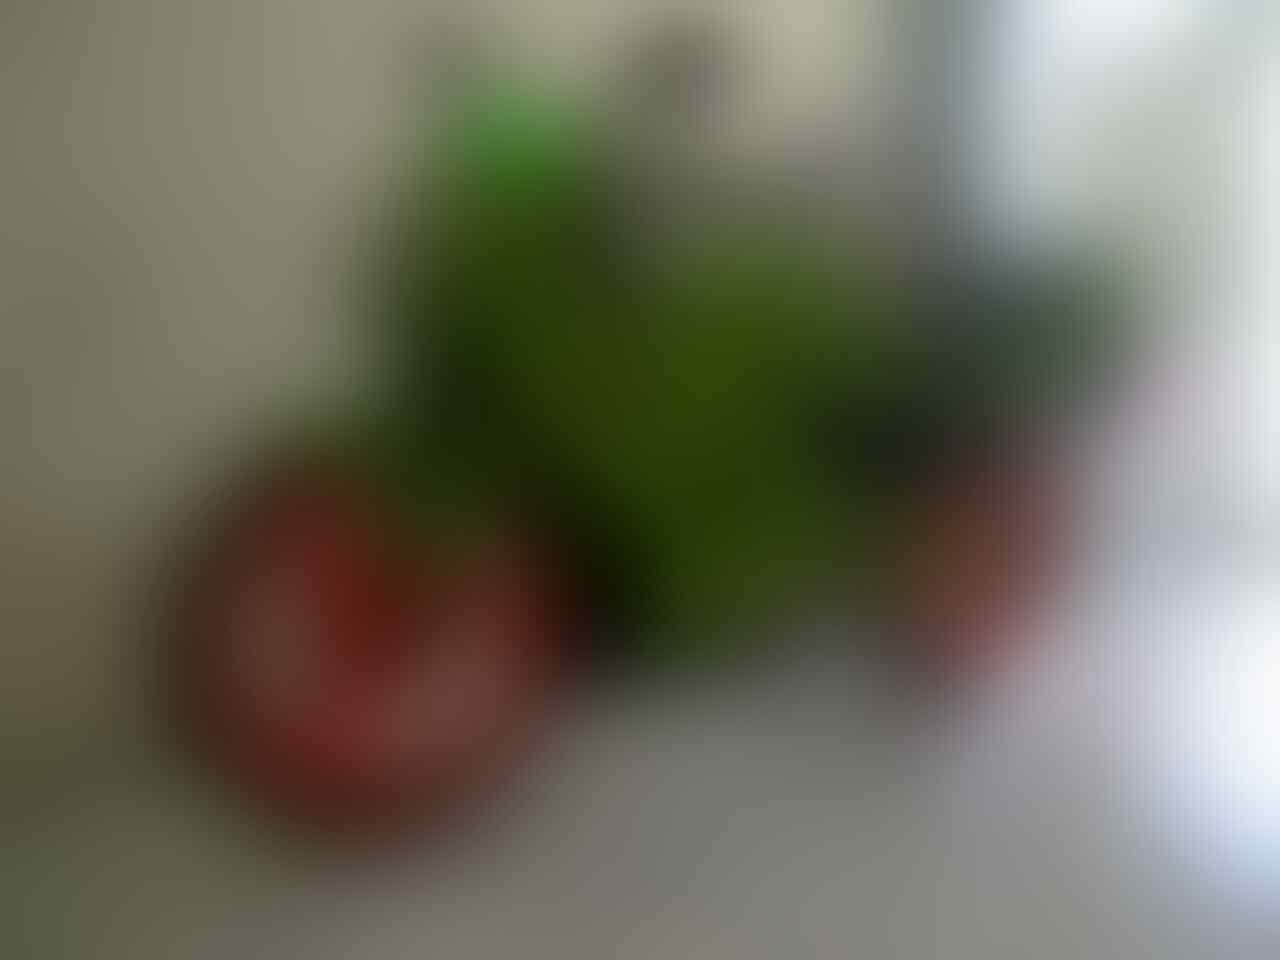 [NKAH]-[Share Info] Serba-Serbi Kawasaki Ninja 150 Versi 25 - Part 6